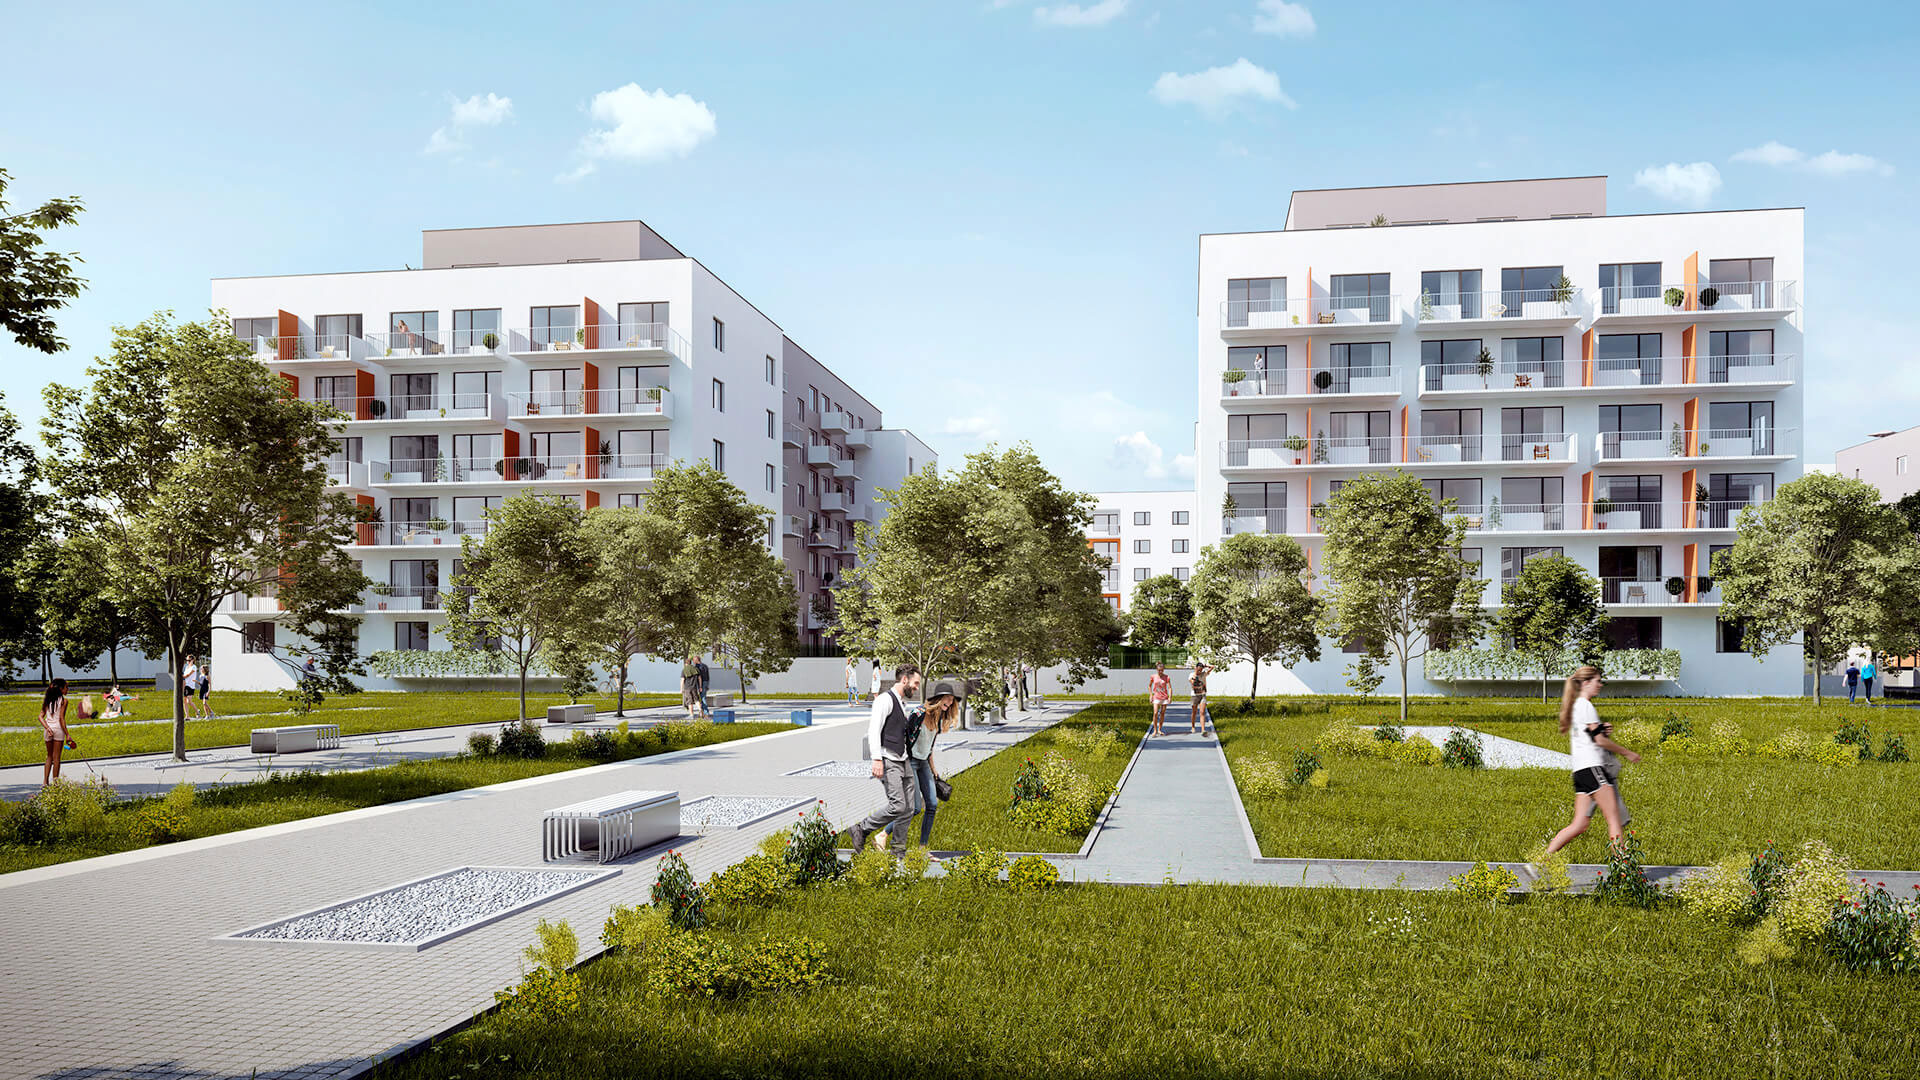 Novostavba Tulipa City II prodej bytů Praha 9 - Vysočany